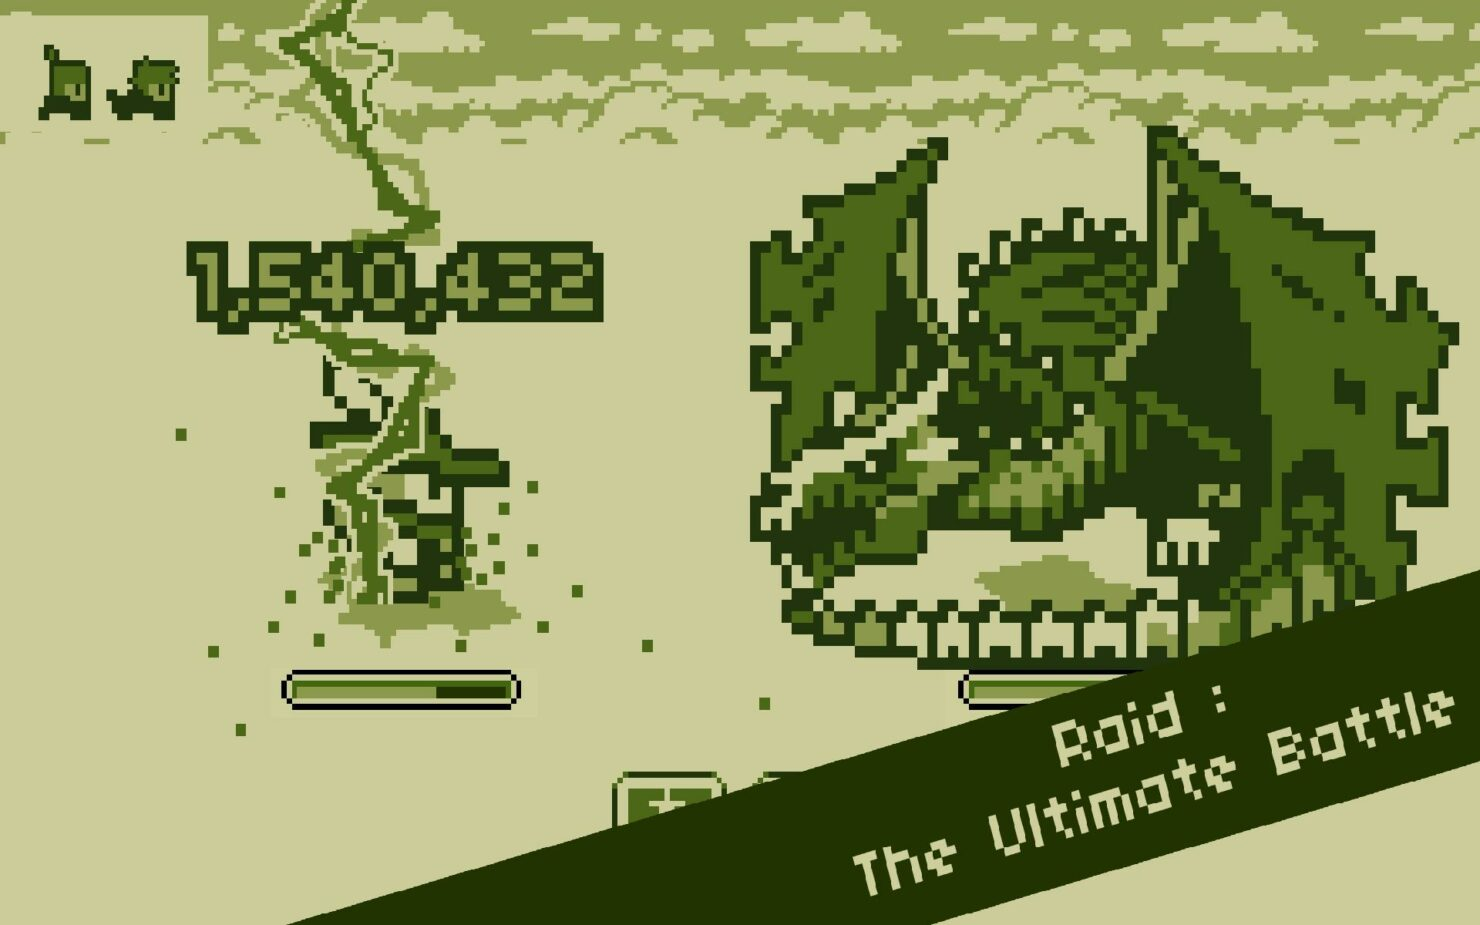 download-timing-hero-vip-retro-fighting-action-rpg1